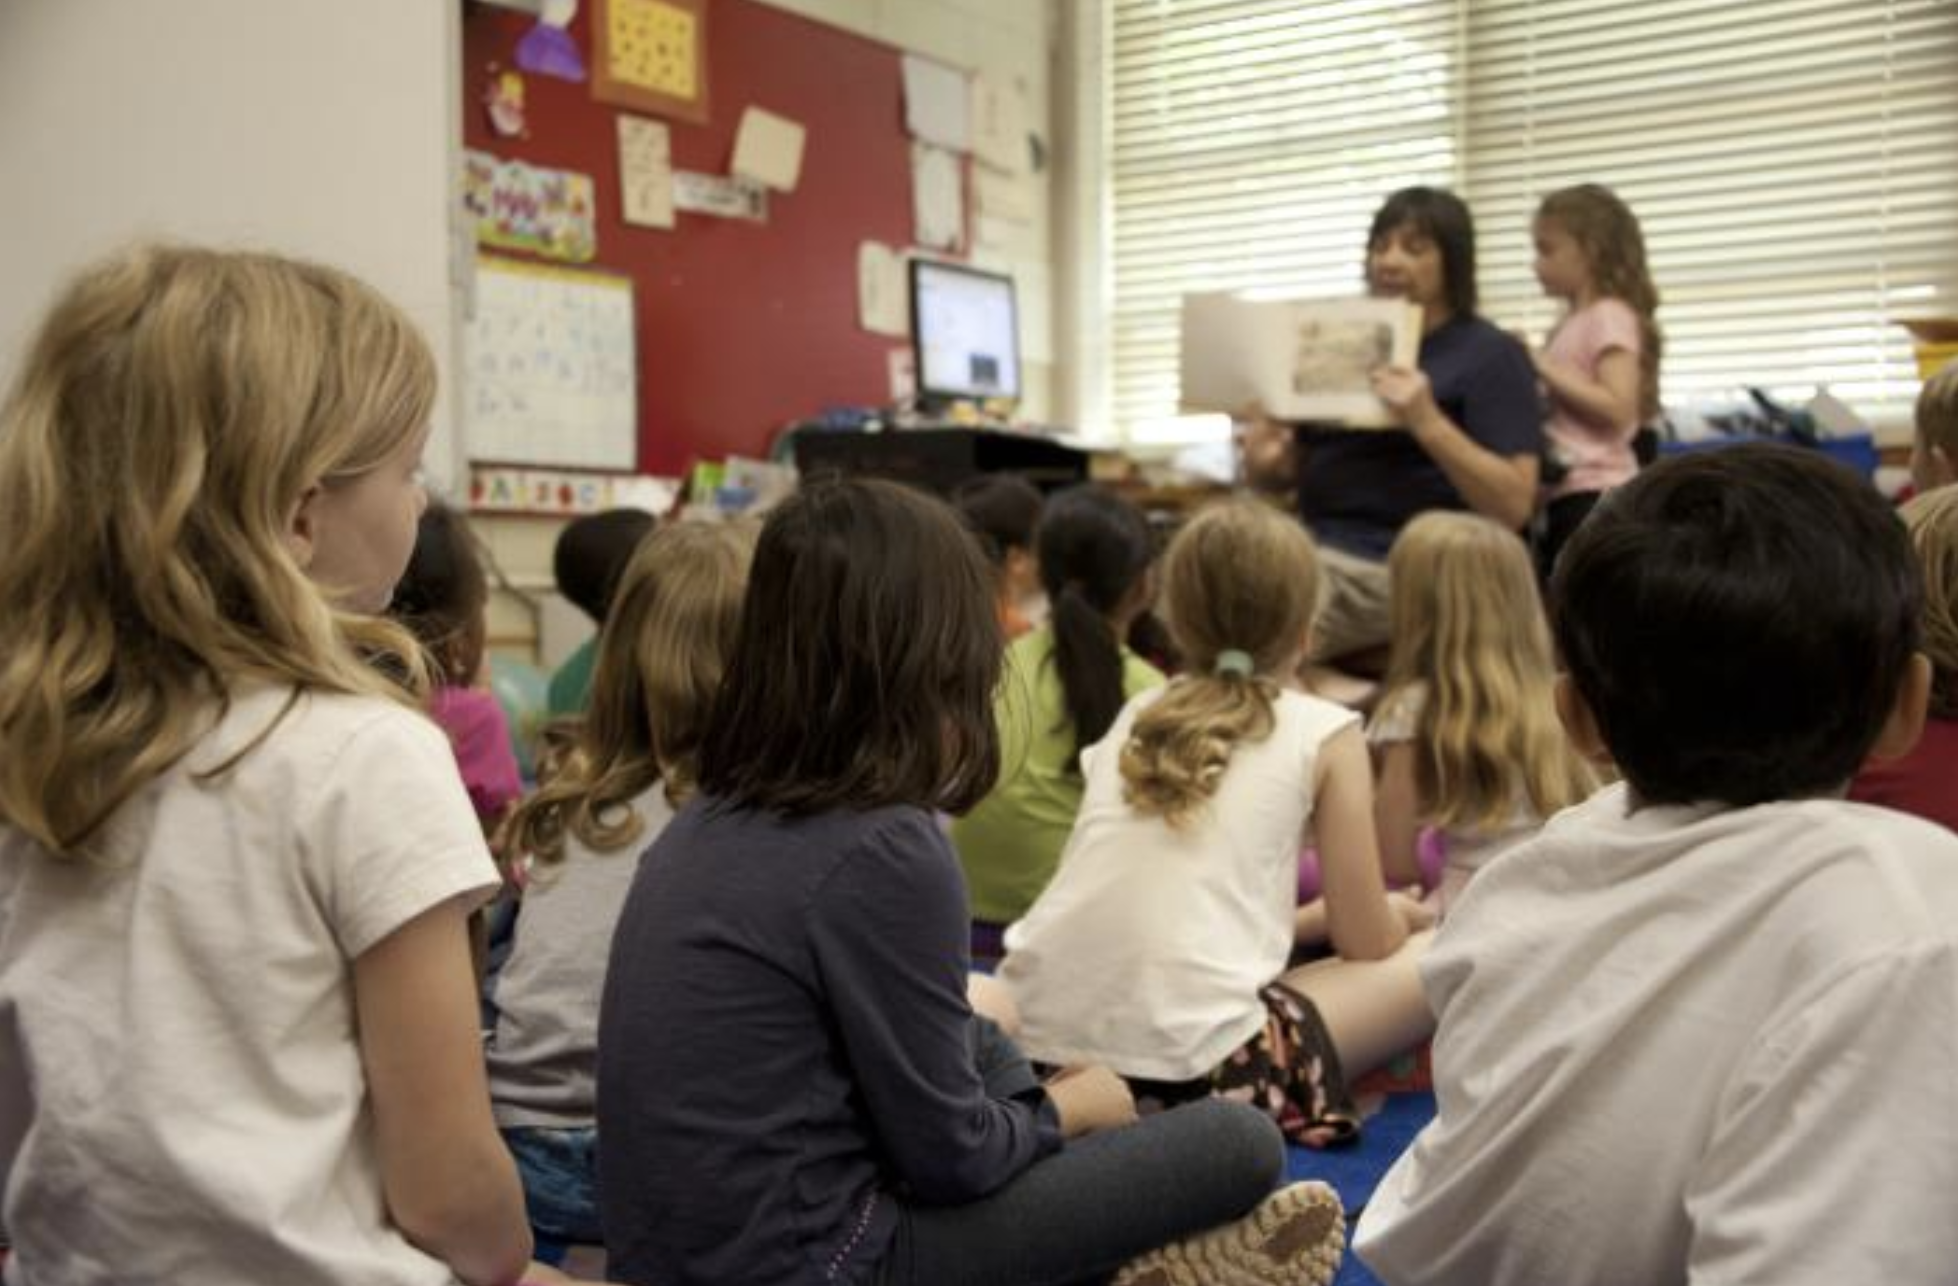 Senate GOP, school choice advocates push new voucher-style program in Minnesota